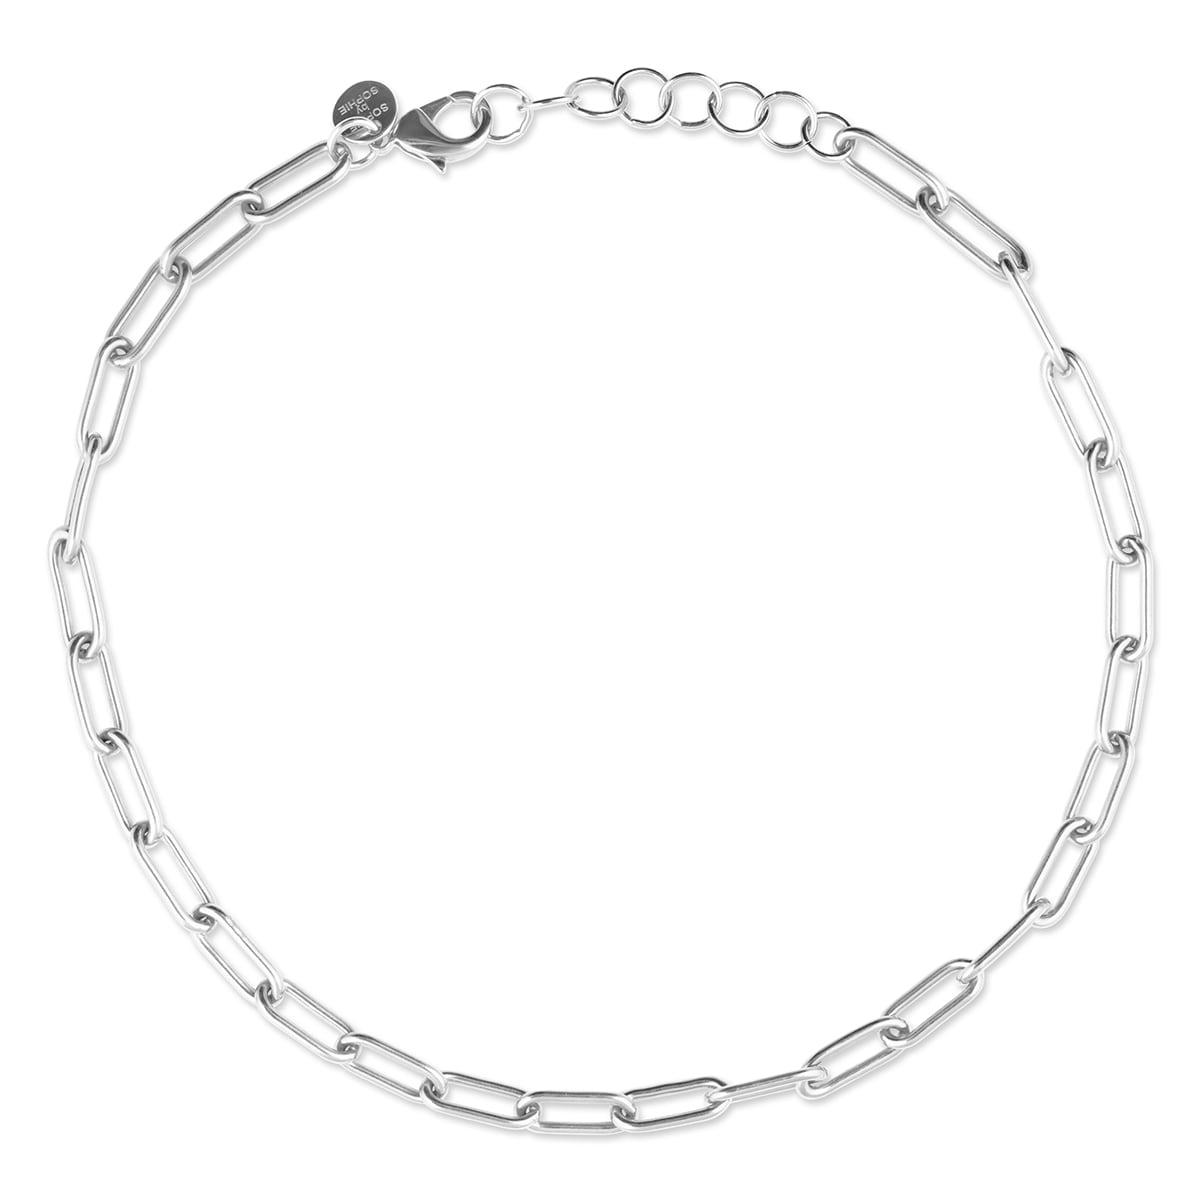 Sophie_by_Sophie_Link_chain_necklace_N1883RHB0-OS_hos_Jarl_Sandin